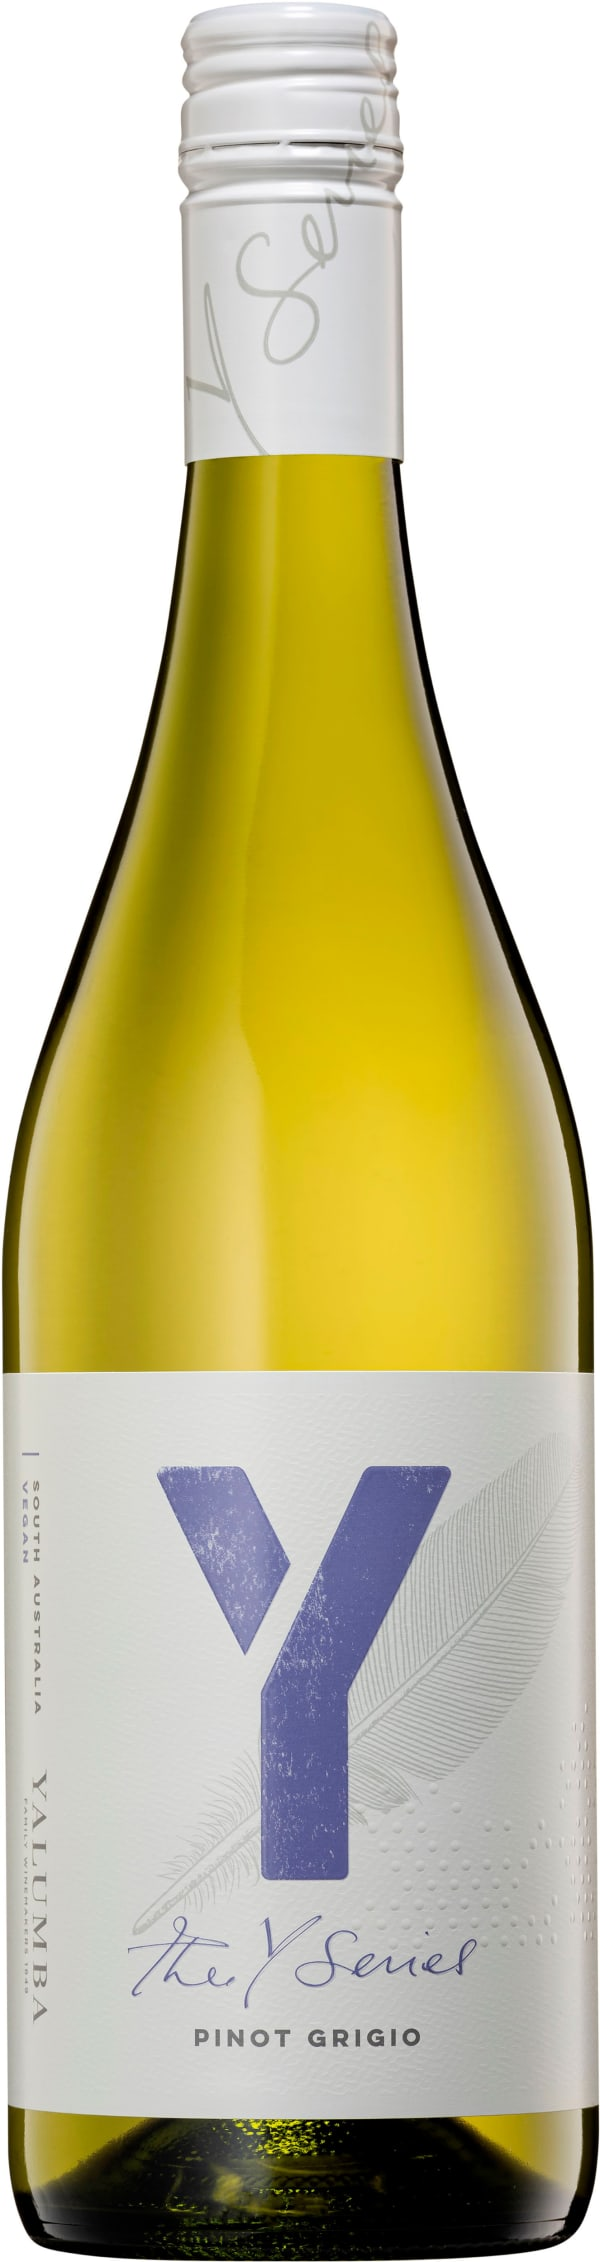 Yalumba Y Series Pinot Grigio 2016